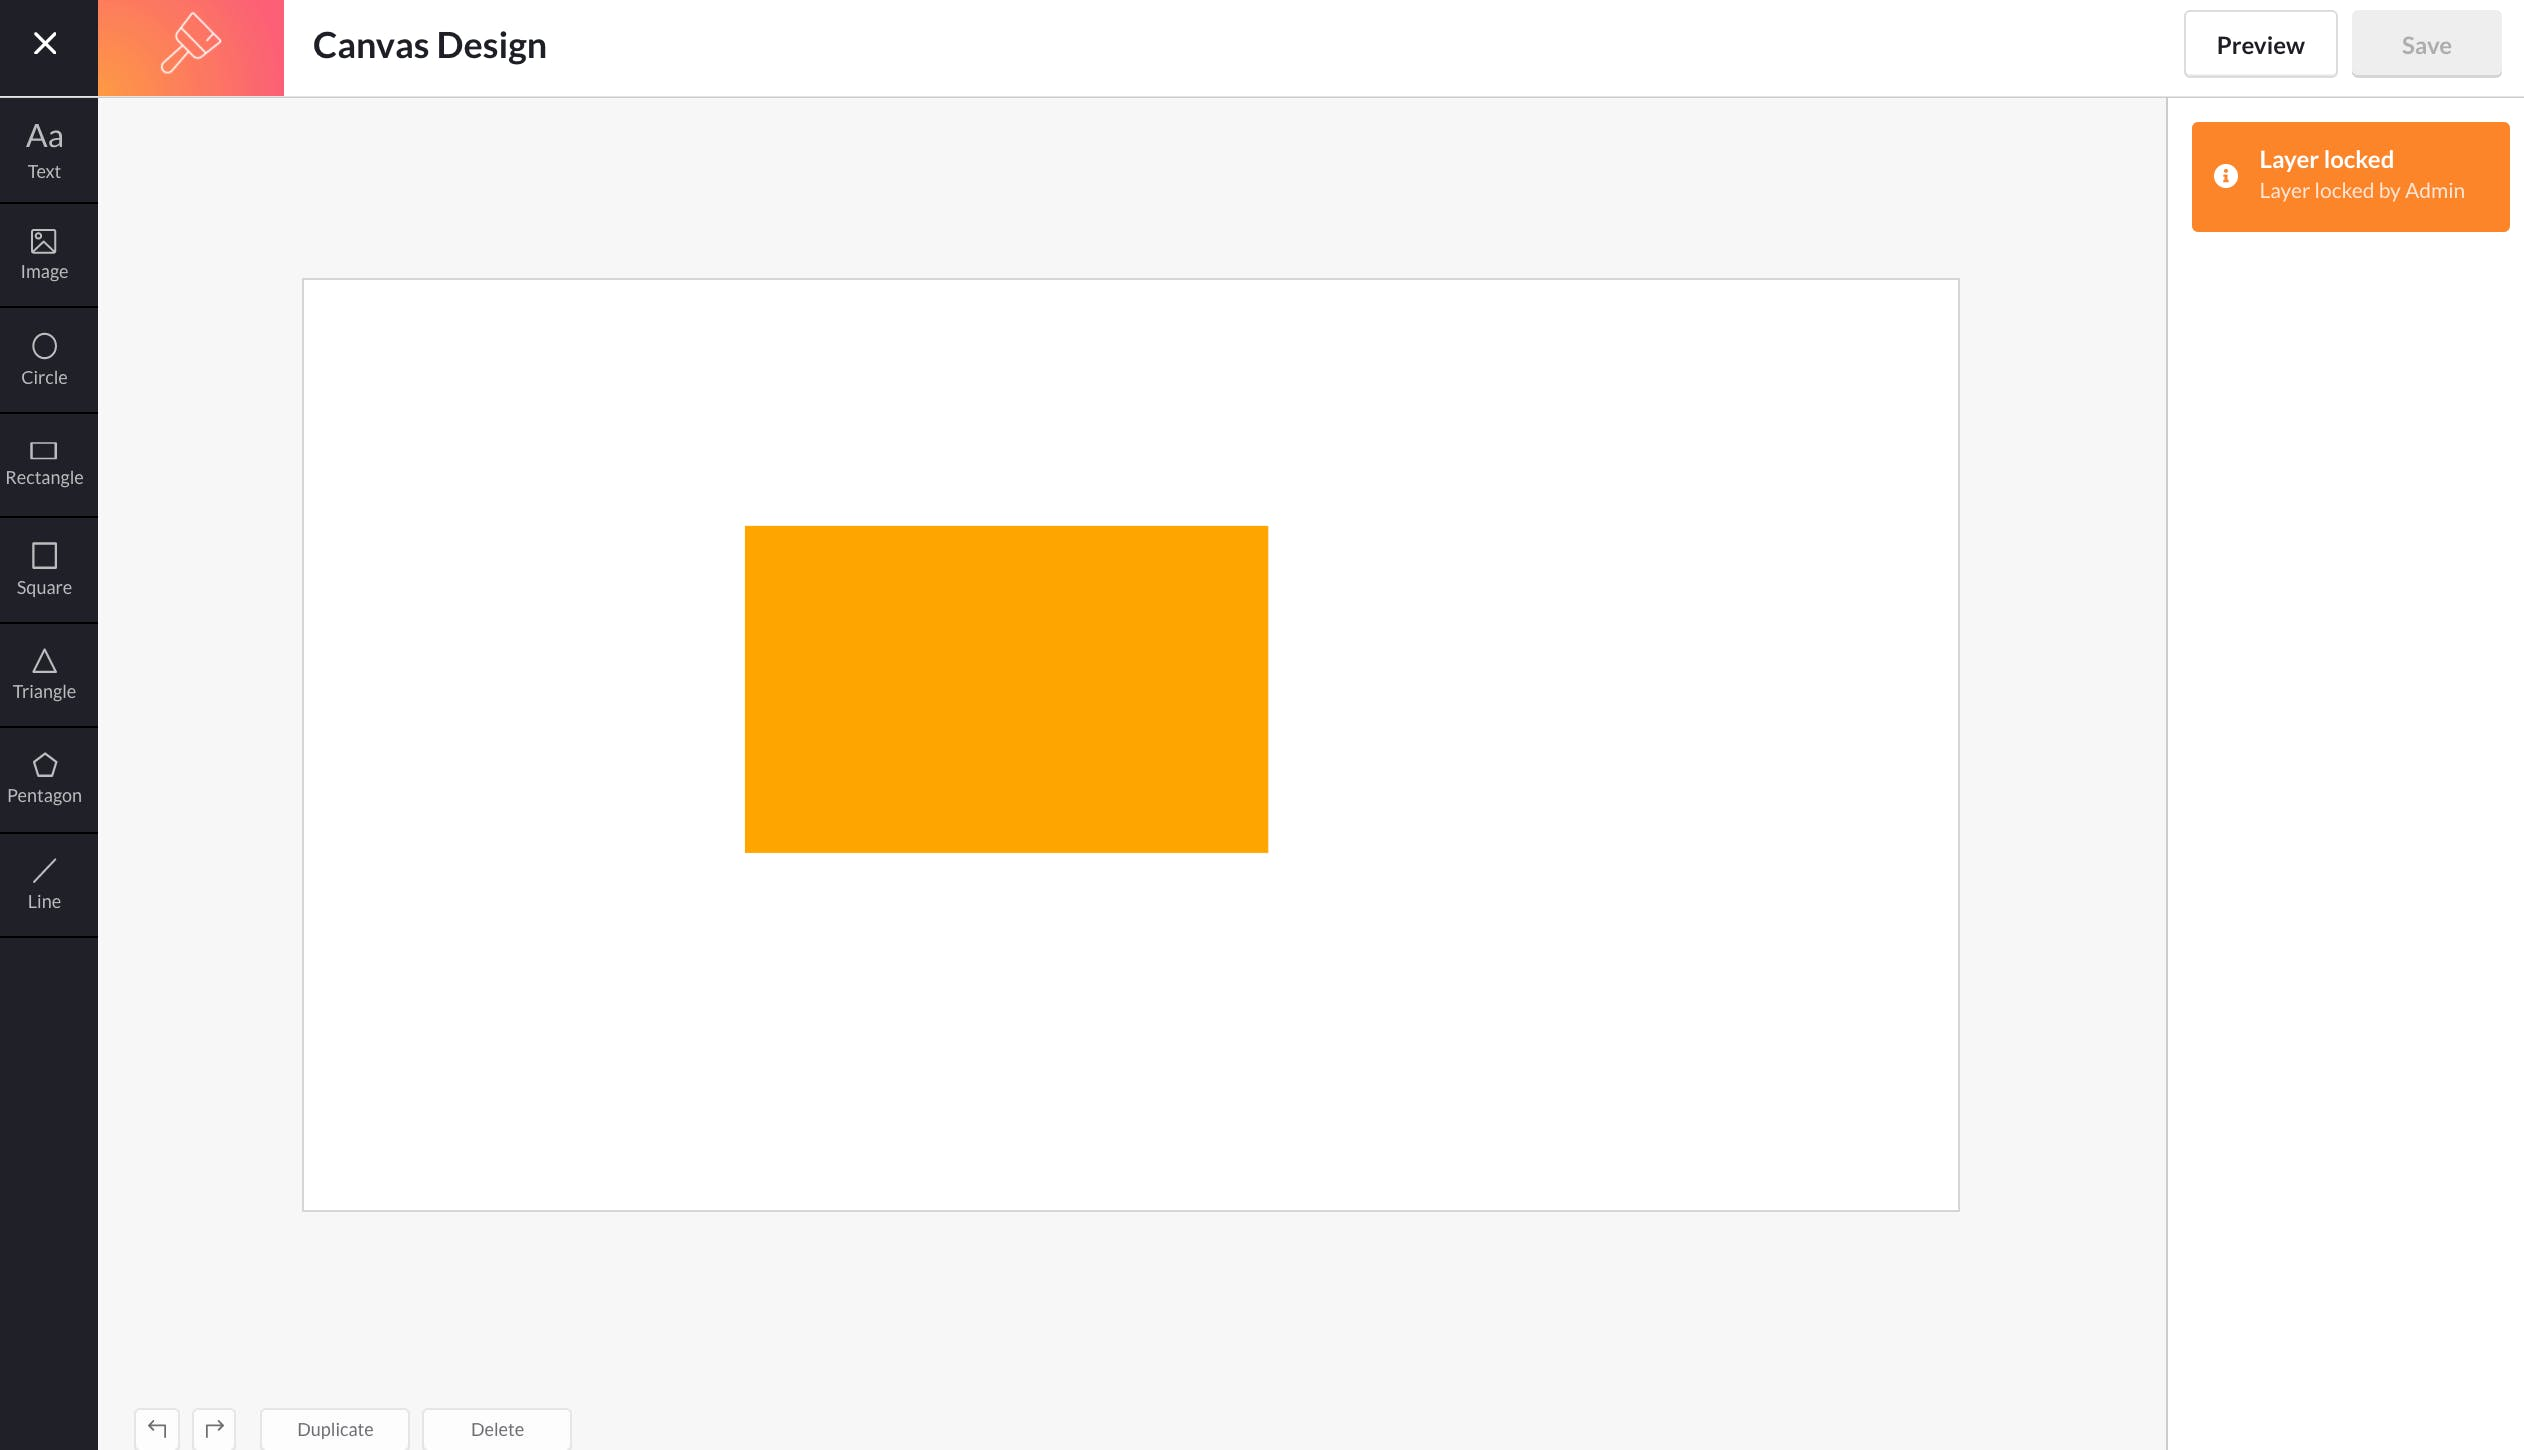 ScreenCloud Canvas App Guide - Creator view 2.10.2021.png